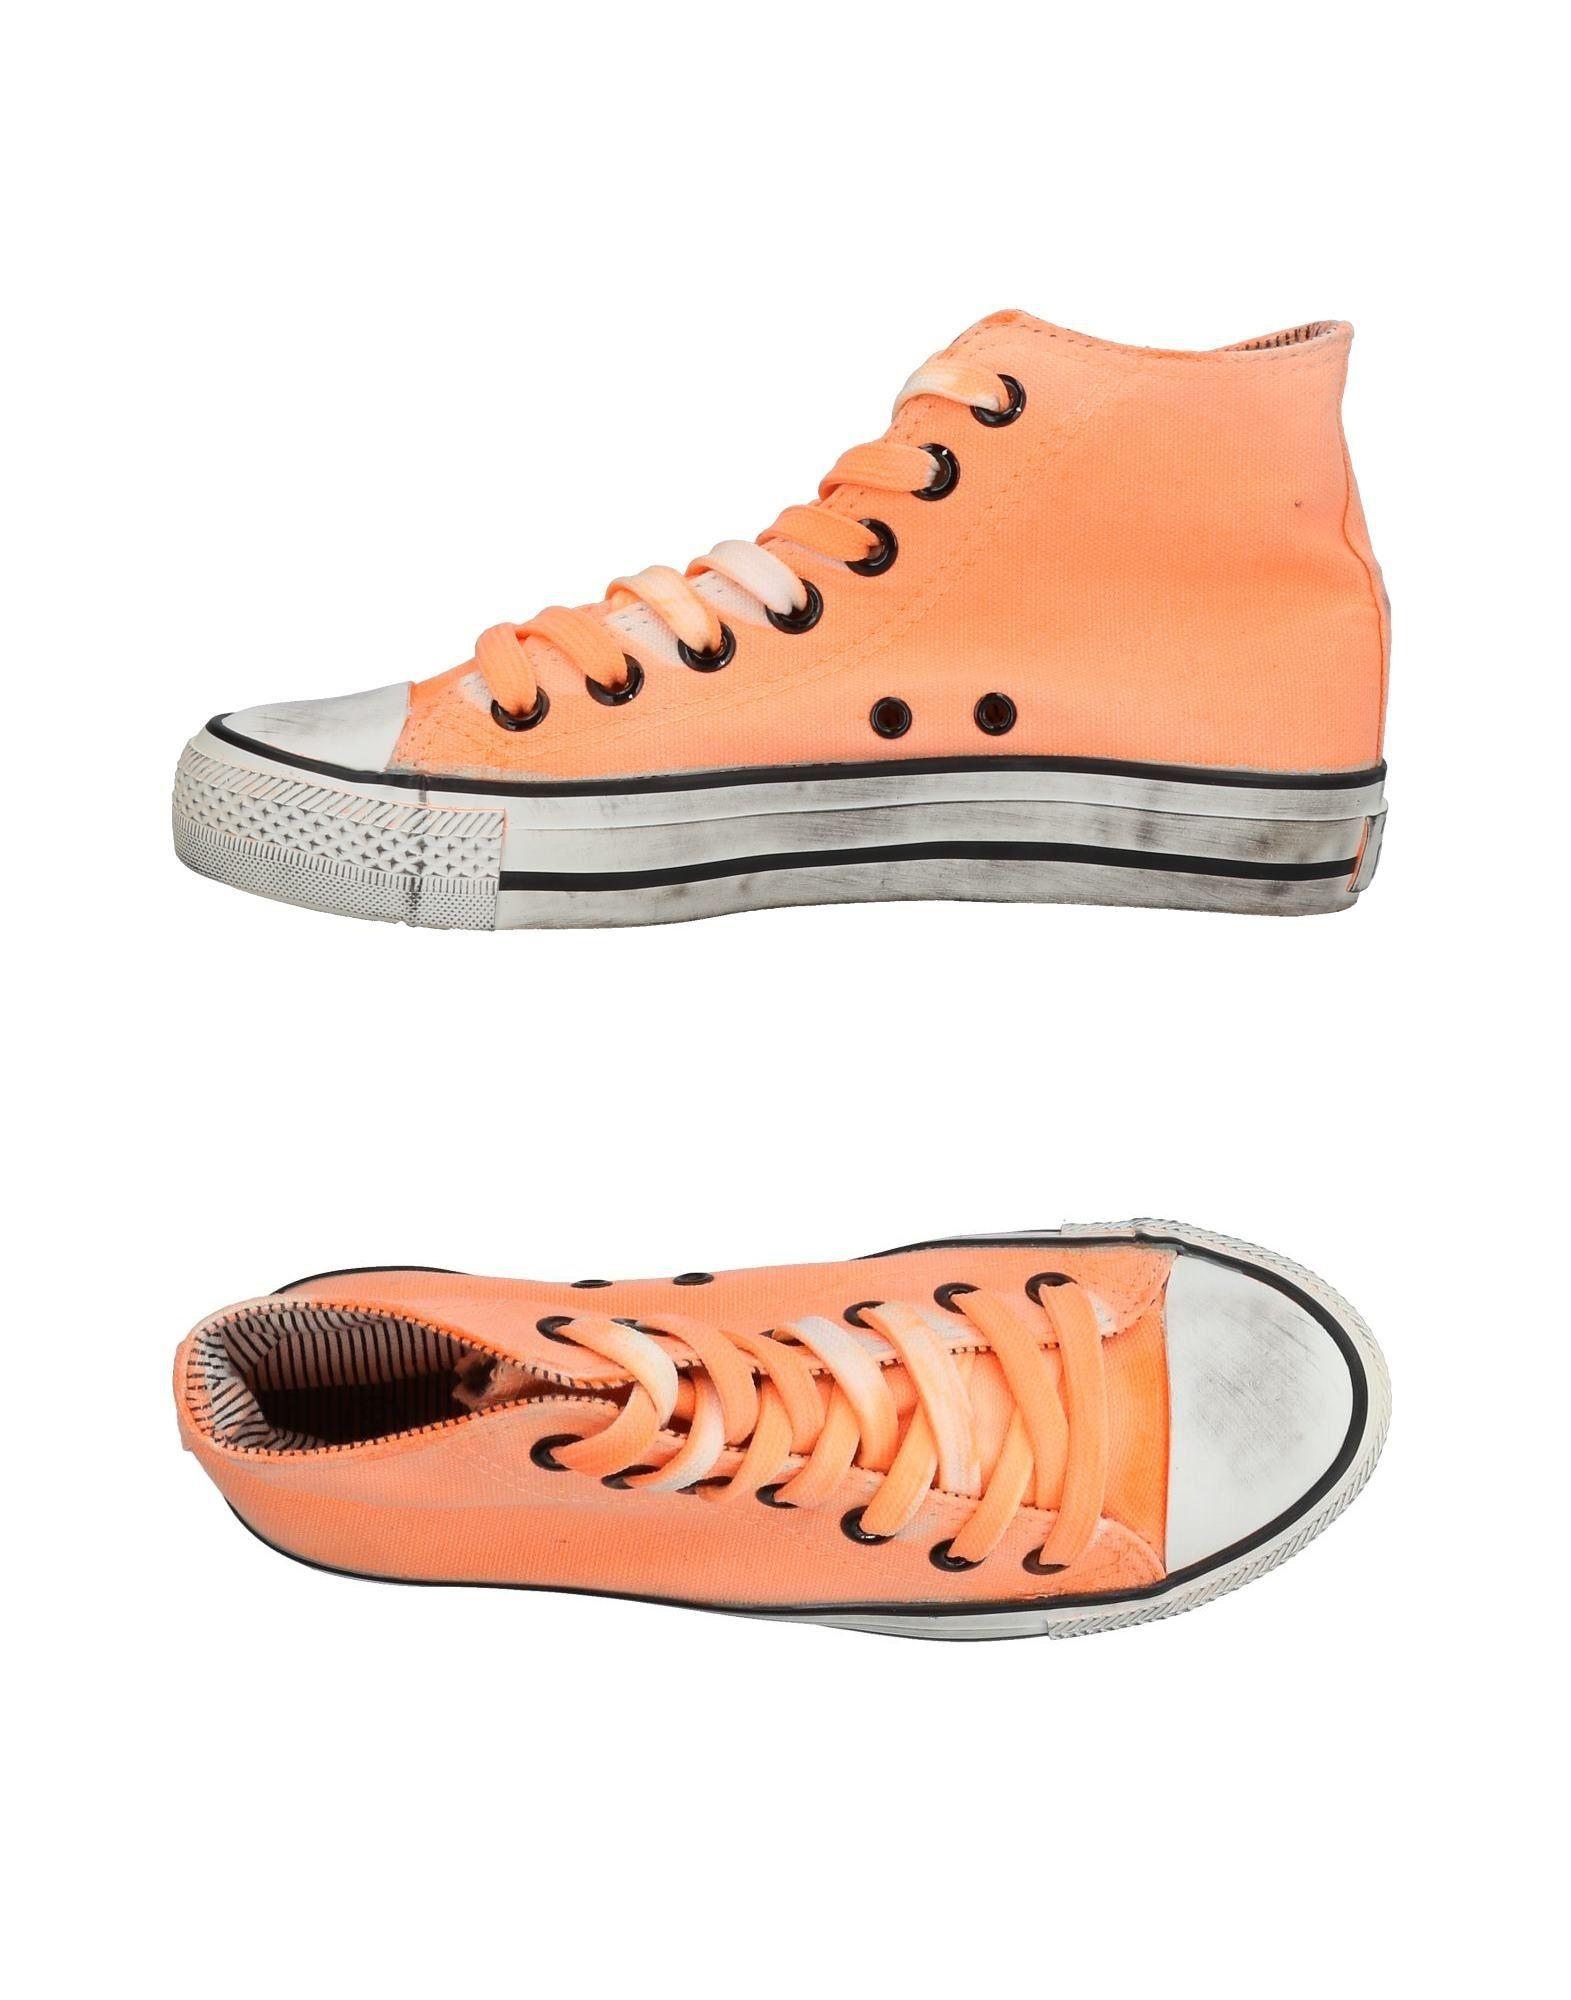 Moda Sneakers 2Star Donna Donna 2Star - 11442928EK 777279